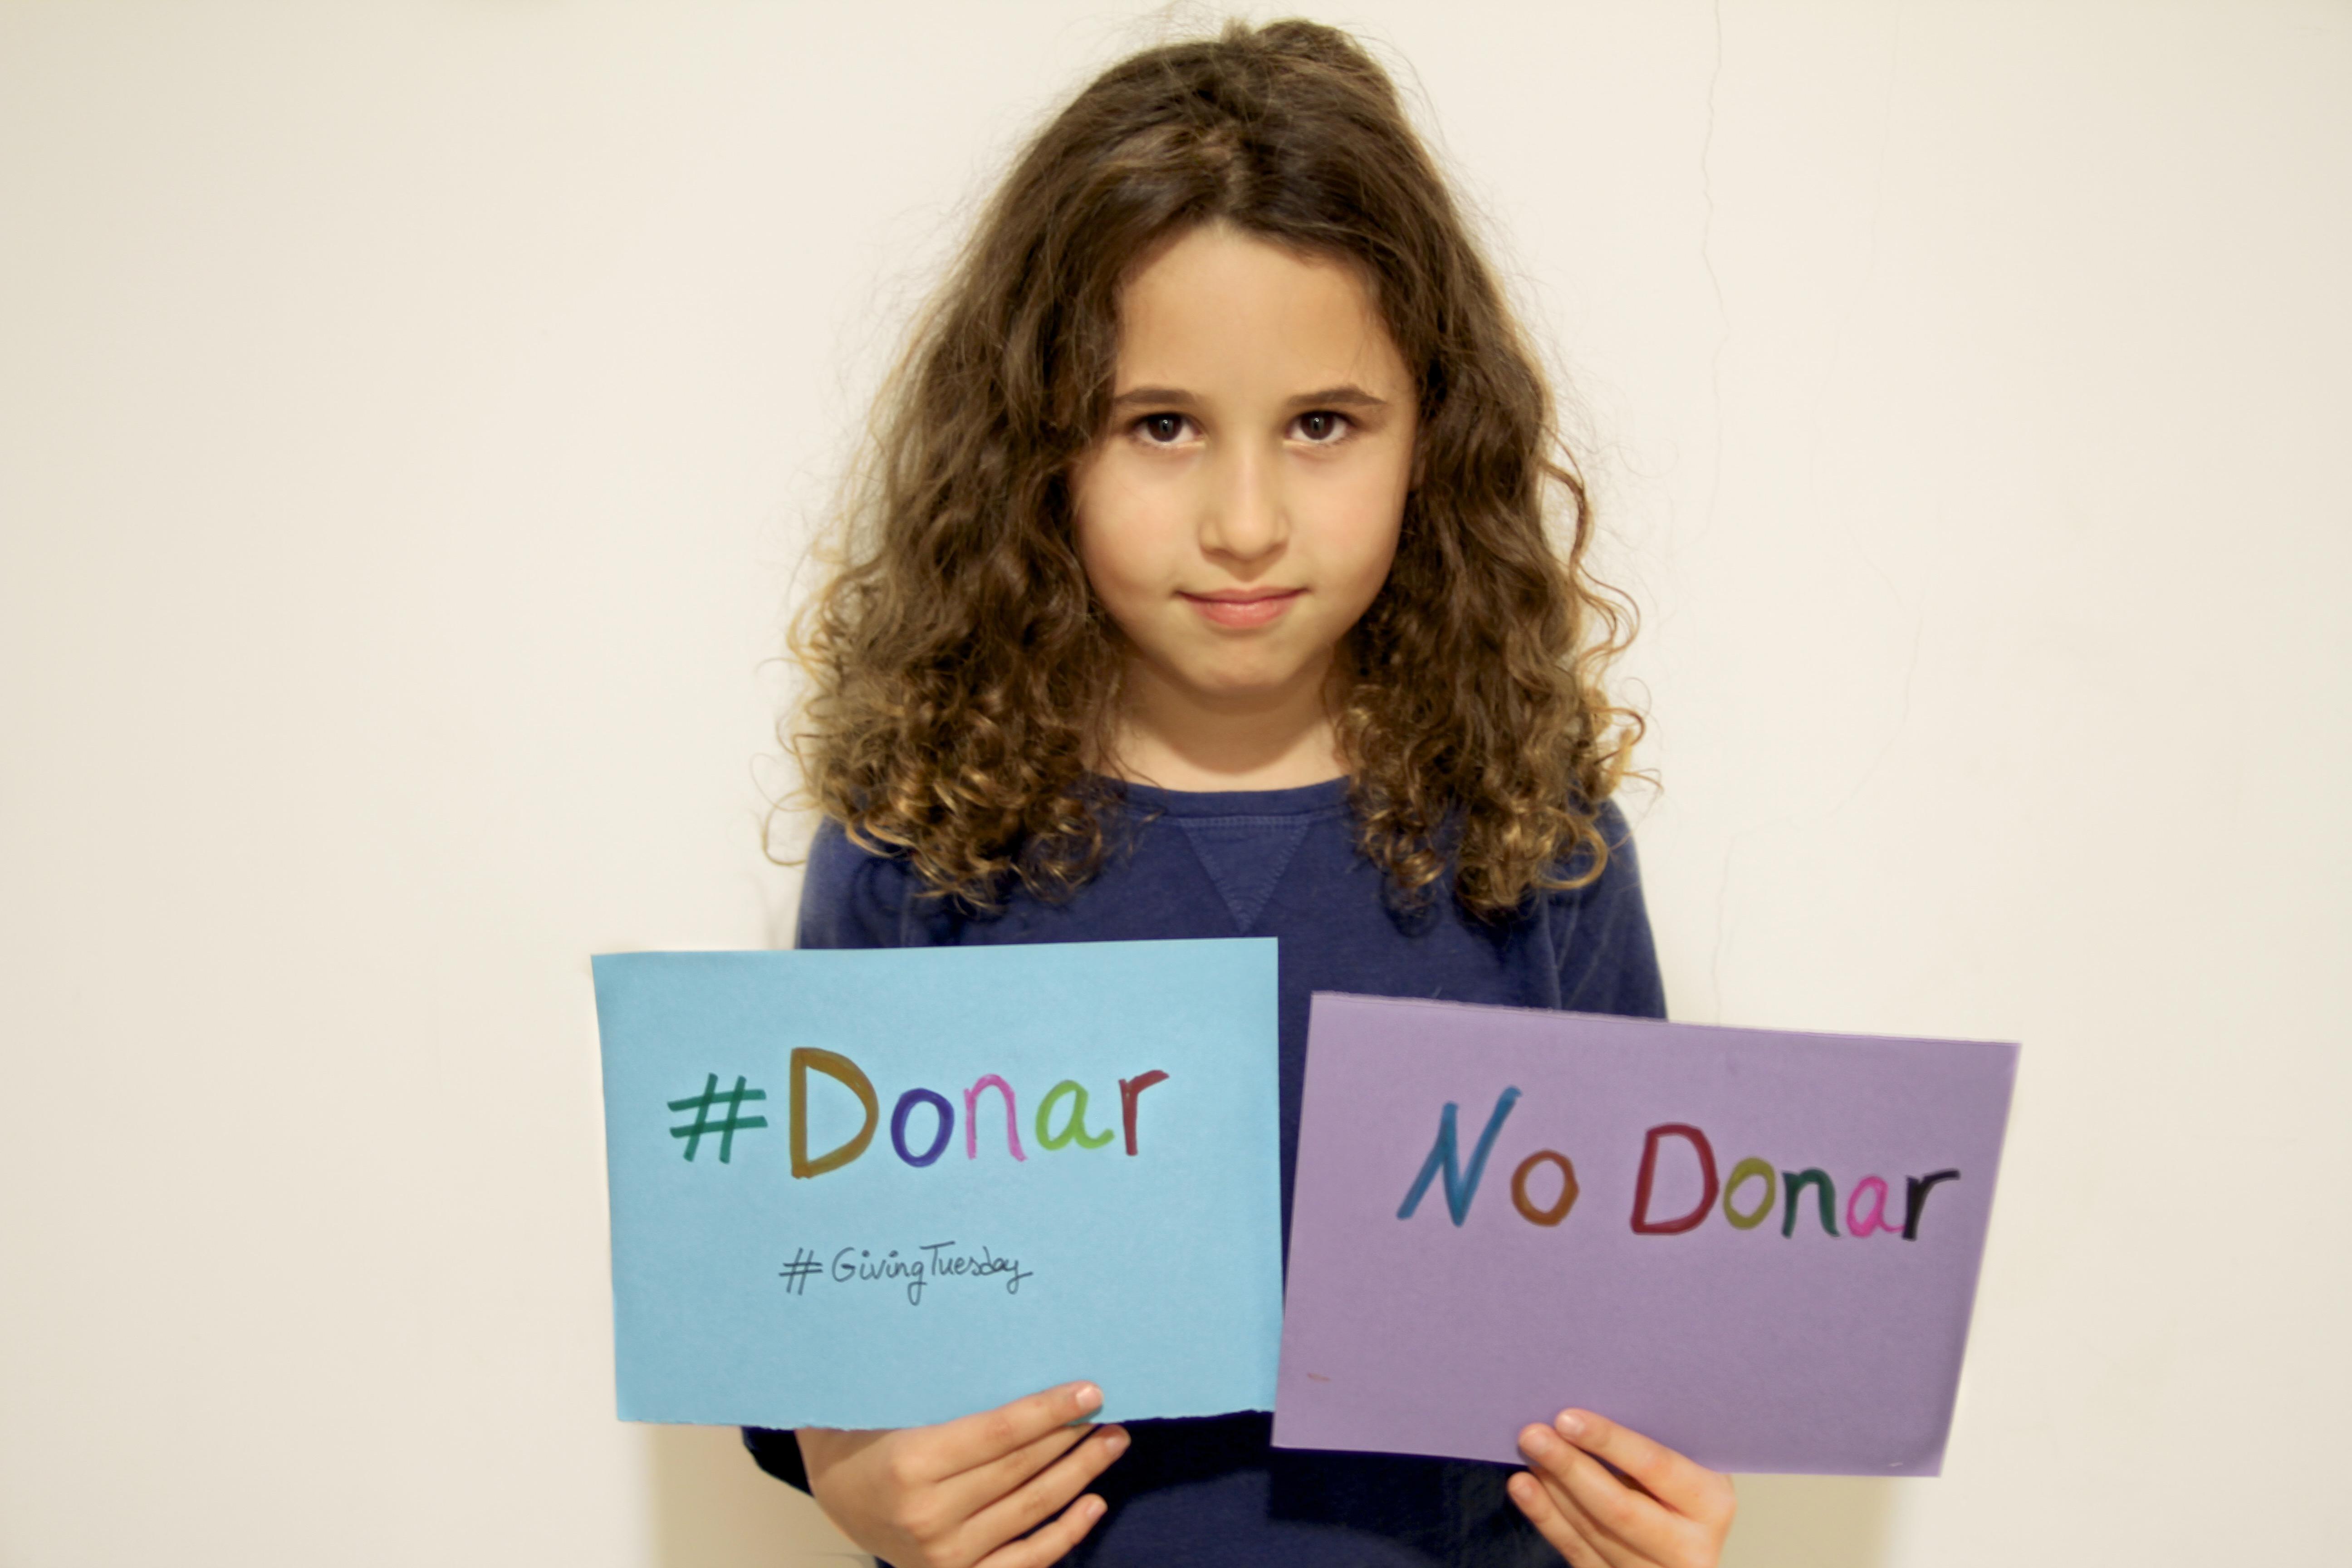 Jimena- la caixa-donar-obra-social-lacaixa-descalzaporelparque-blogger-kids-solidaridad-givingtuesday